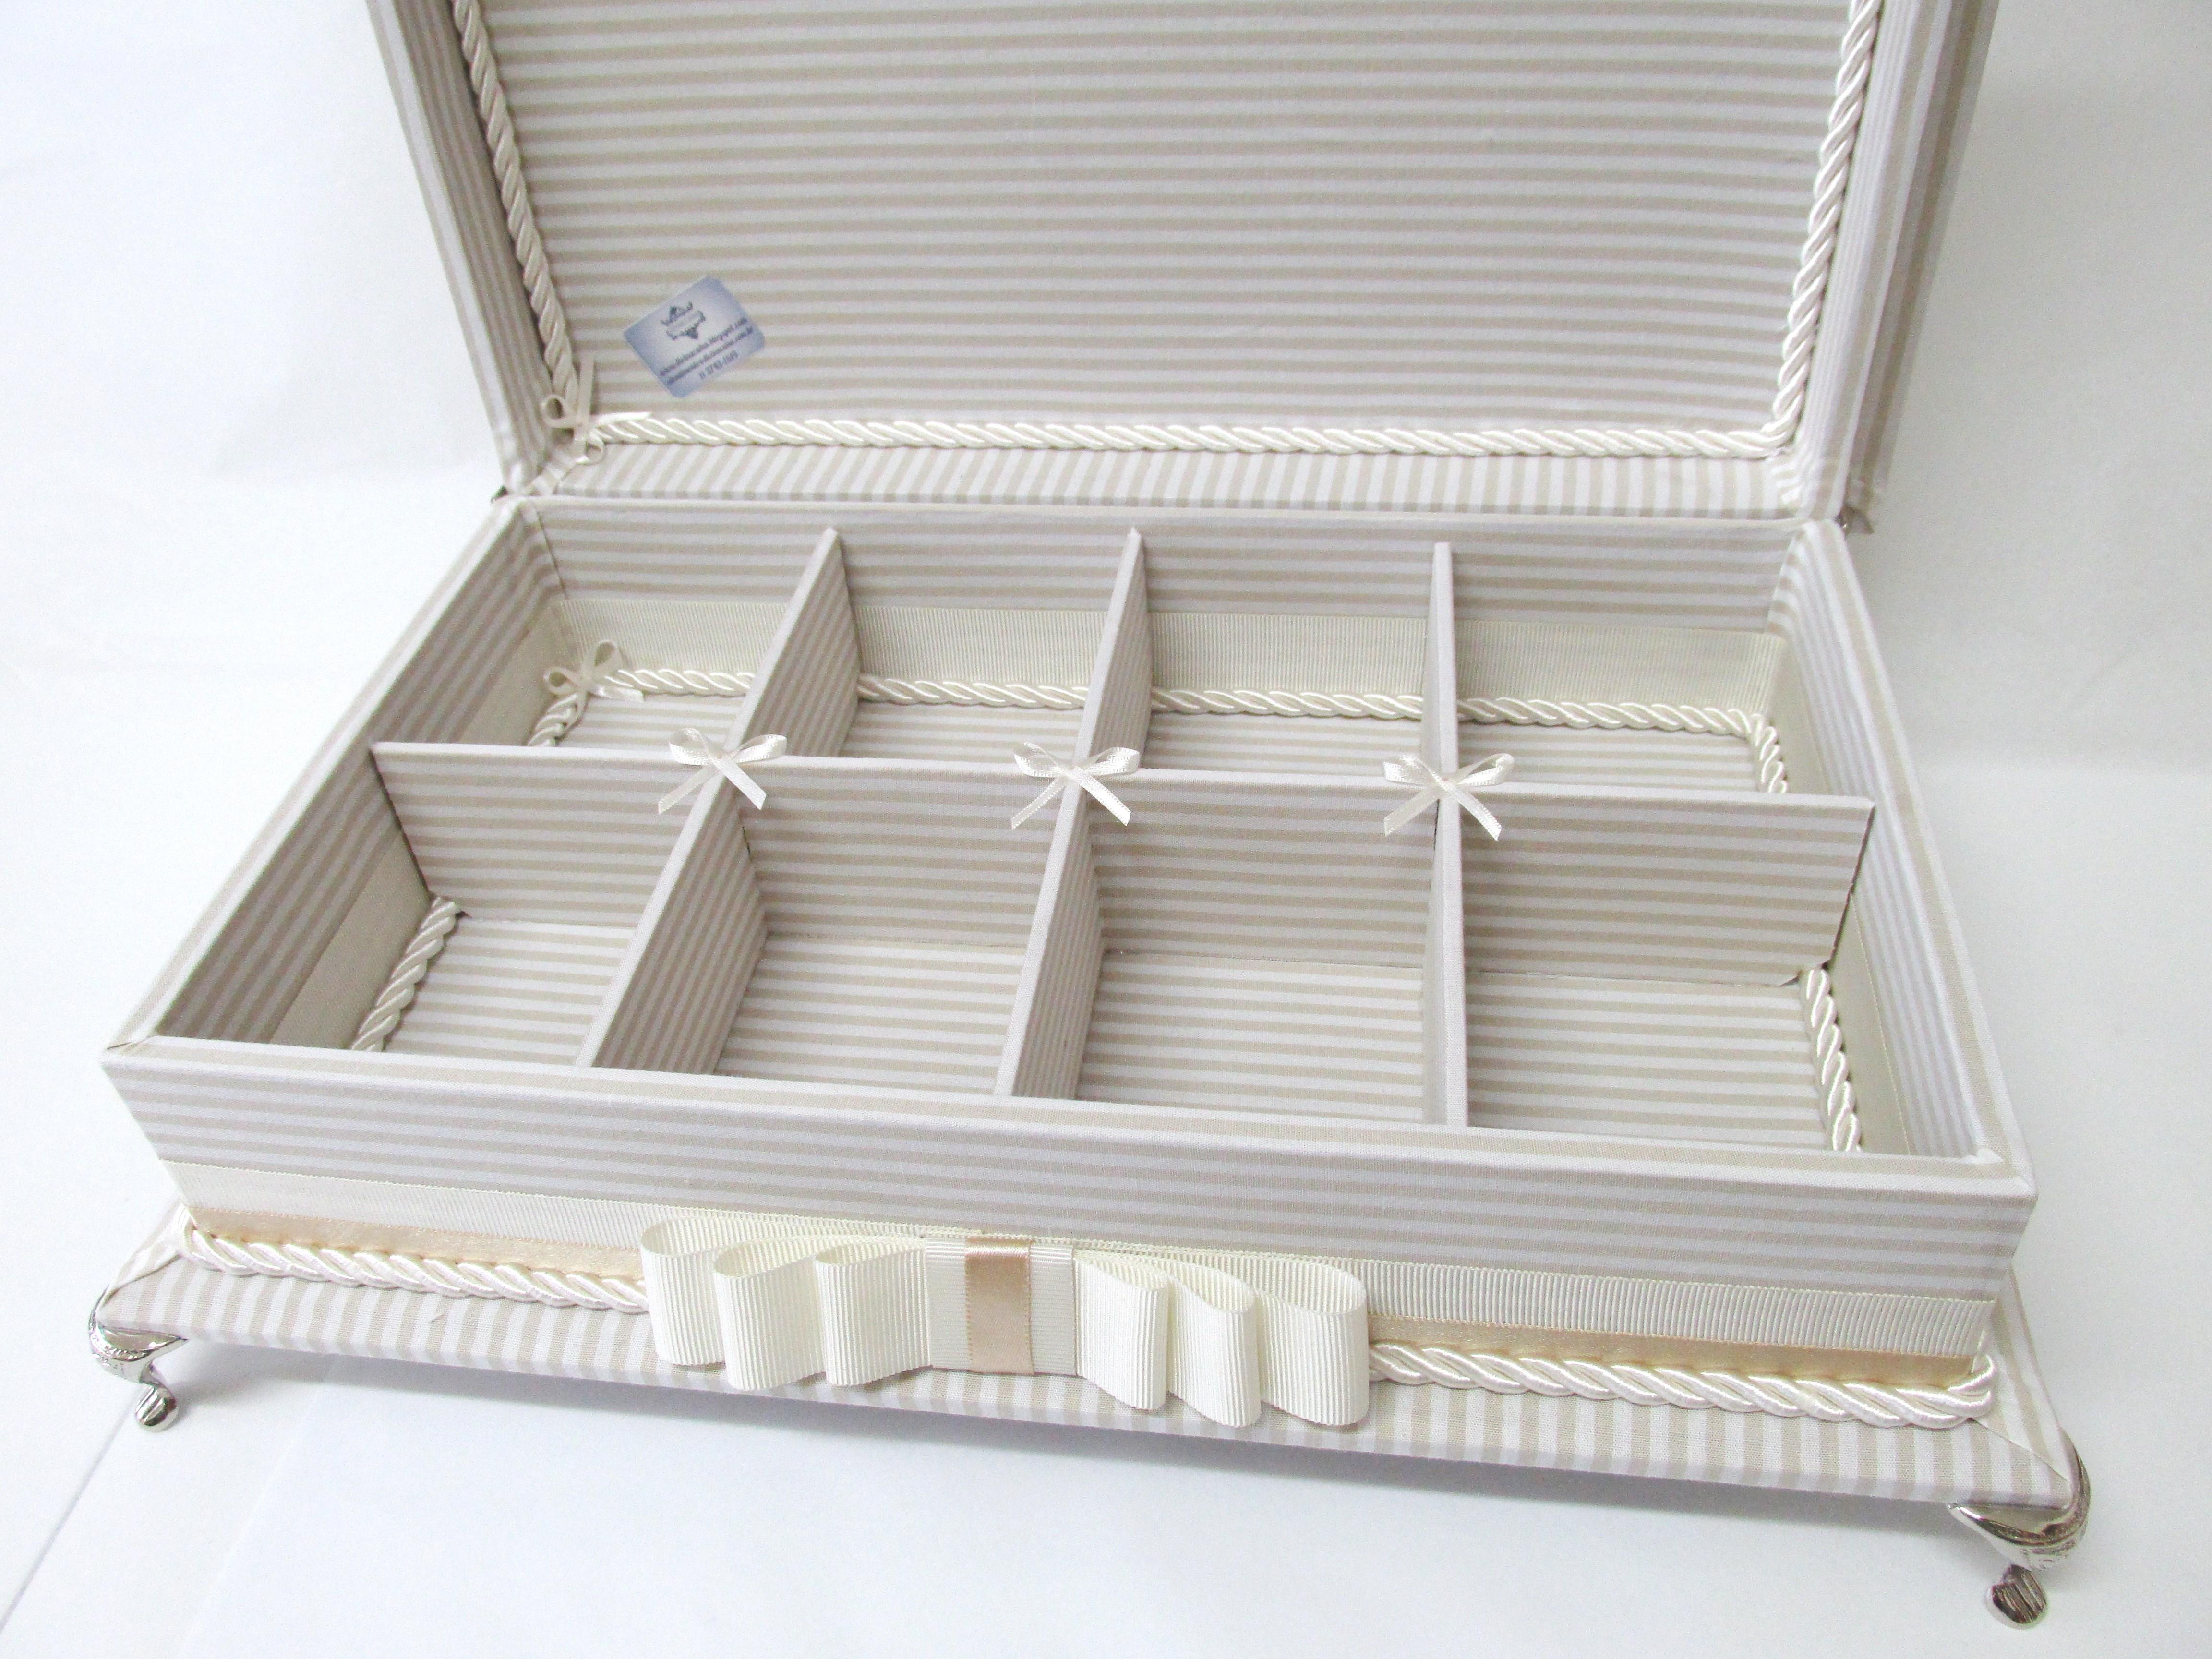 kit banheiro para casamento banheiro caixa kit banheiro para casamento #6A5D4D 4608 3456